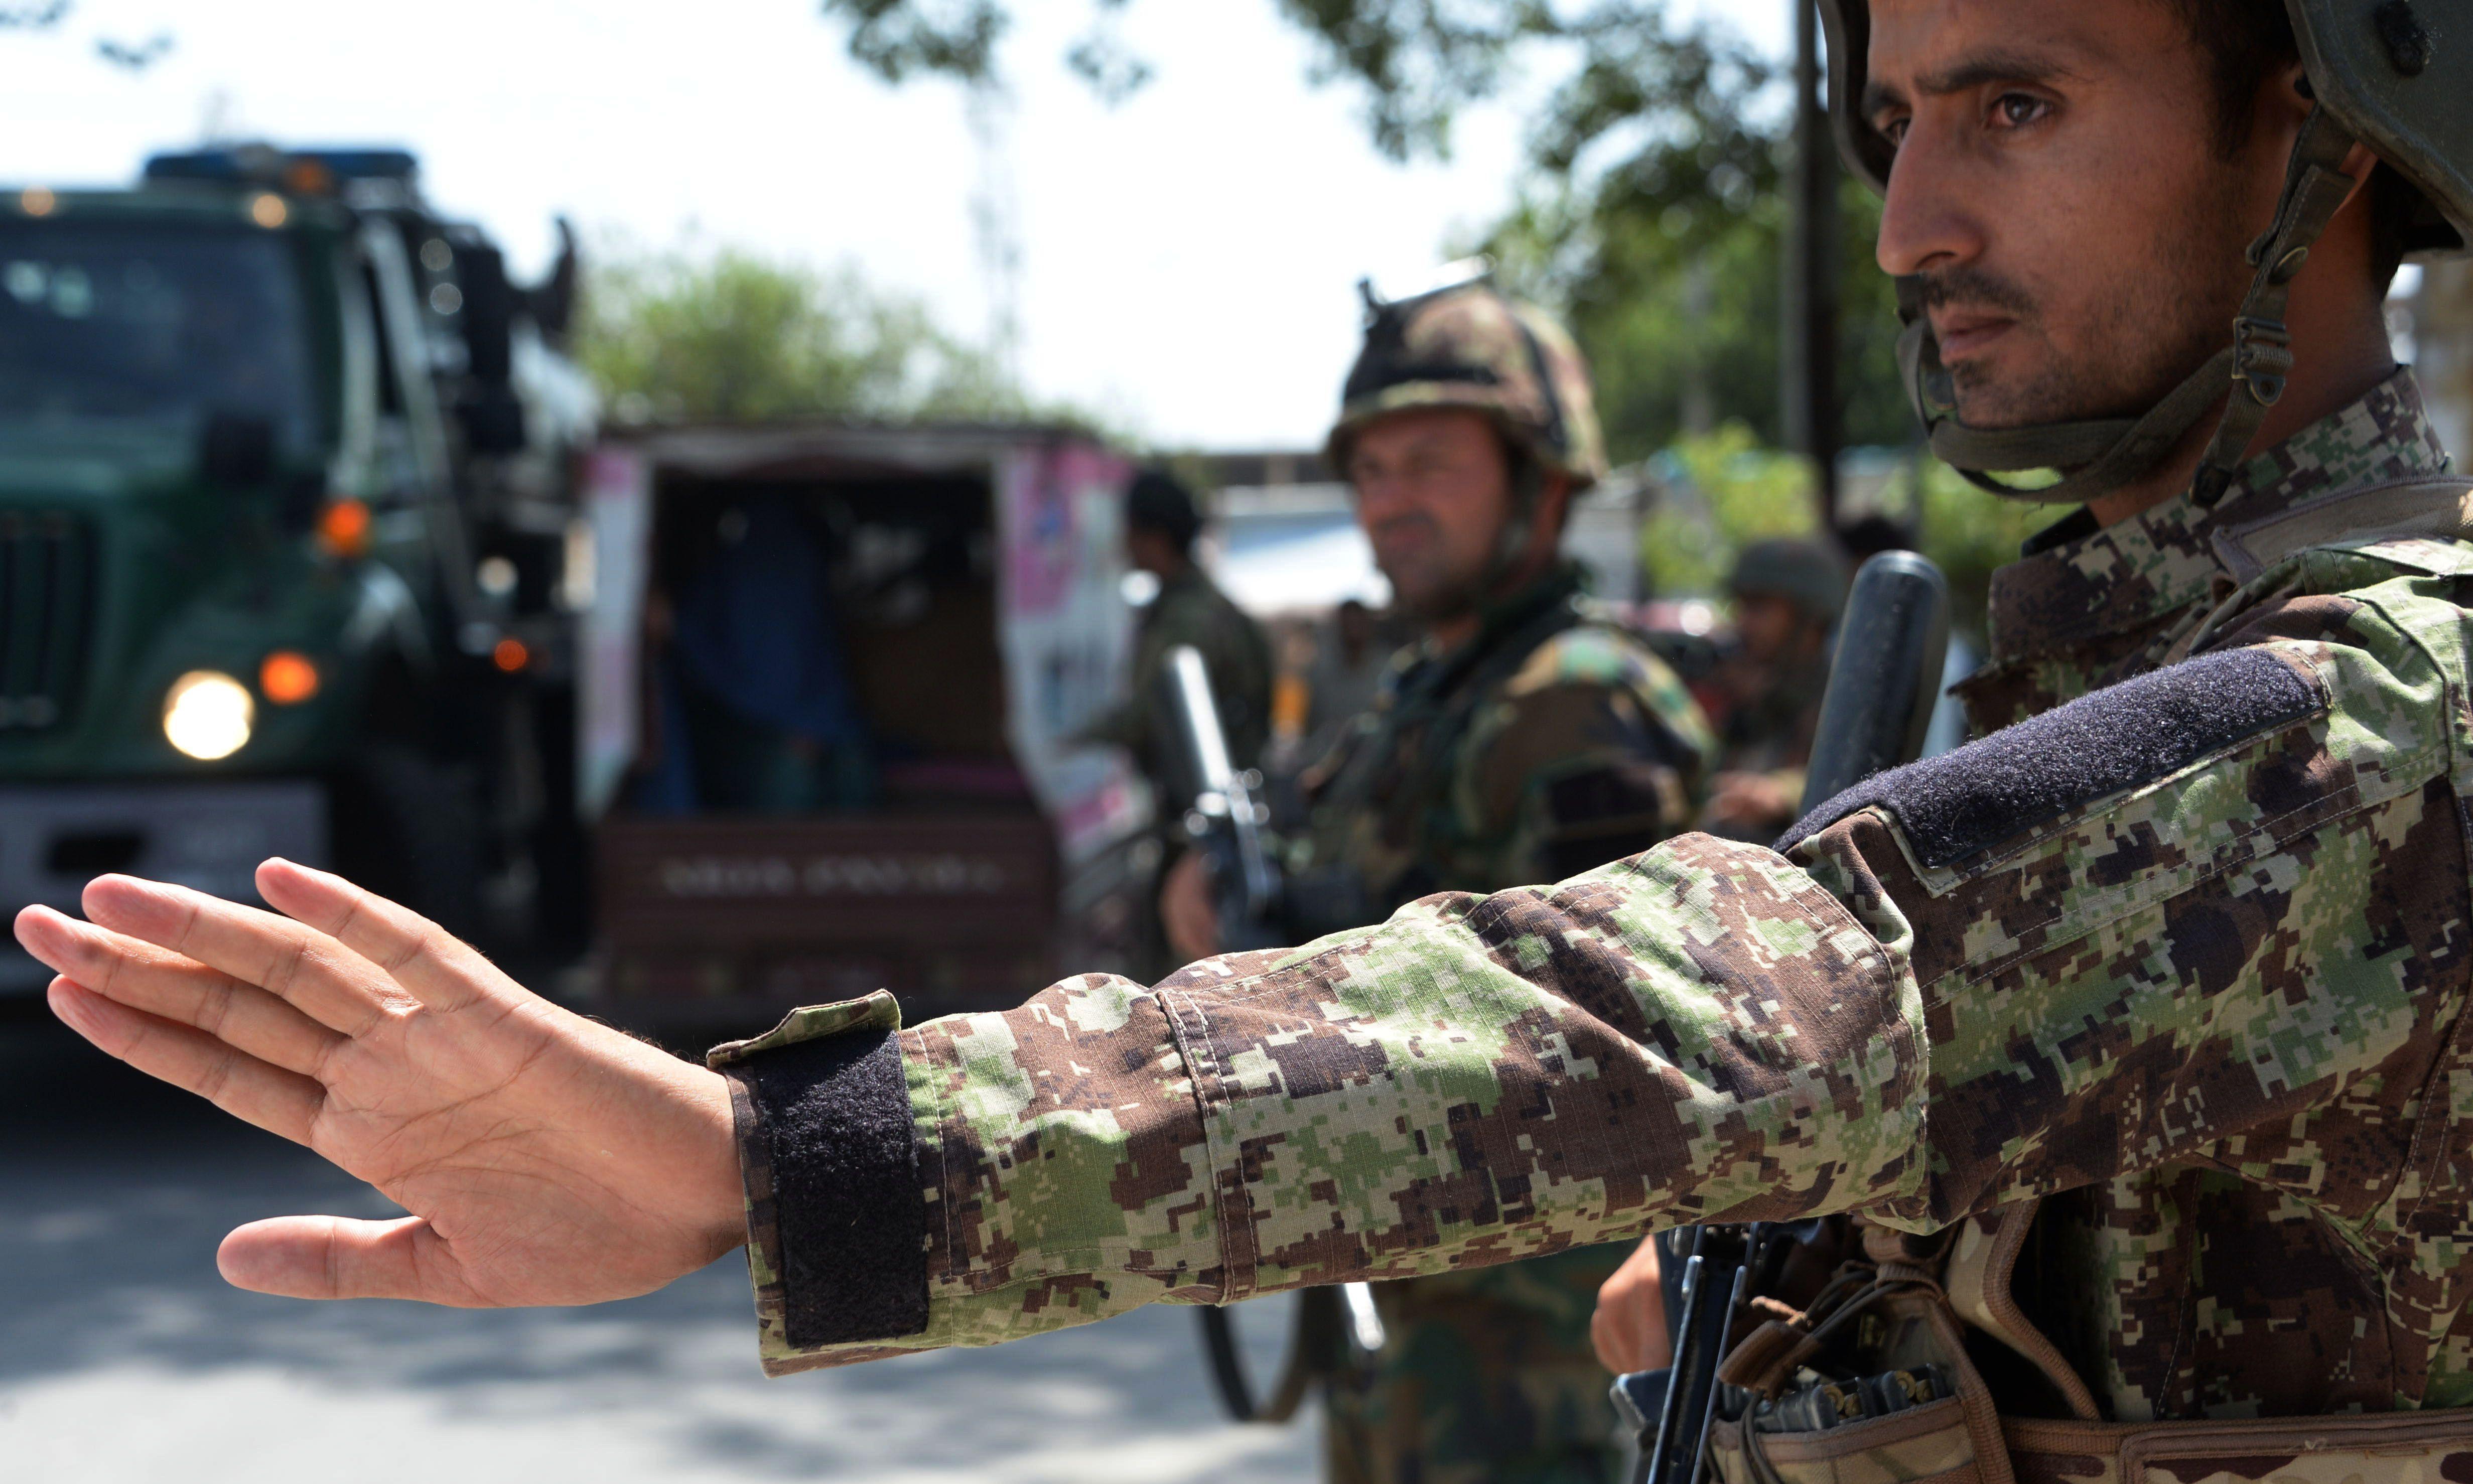 Afghan security forces kill six civilians during insurgent raid